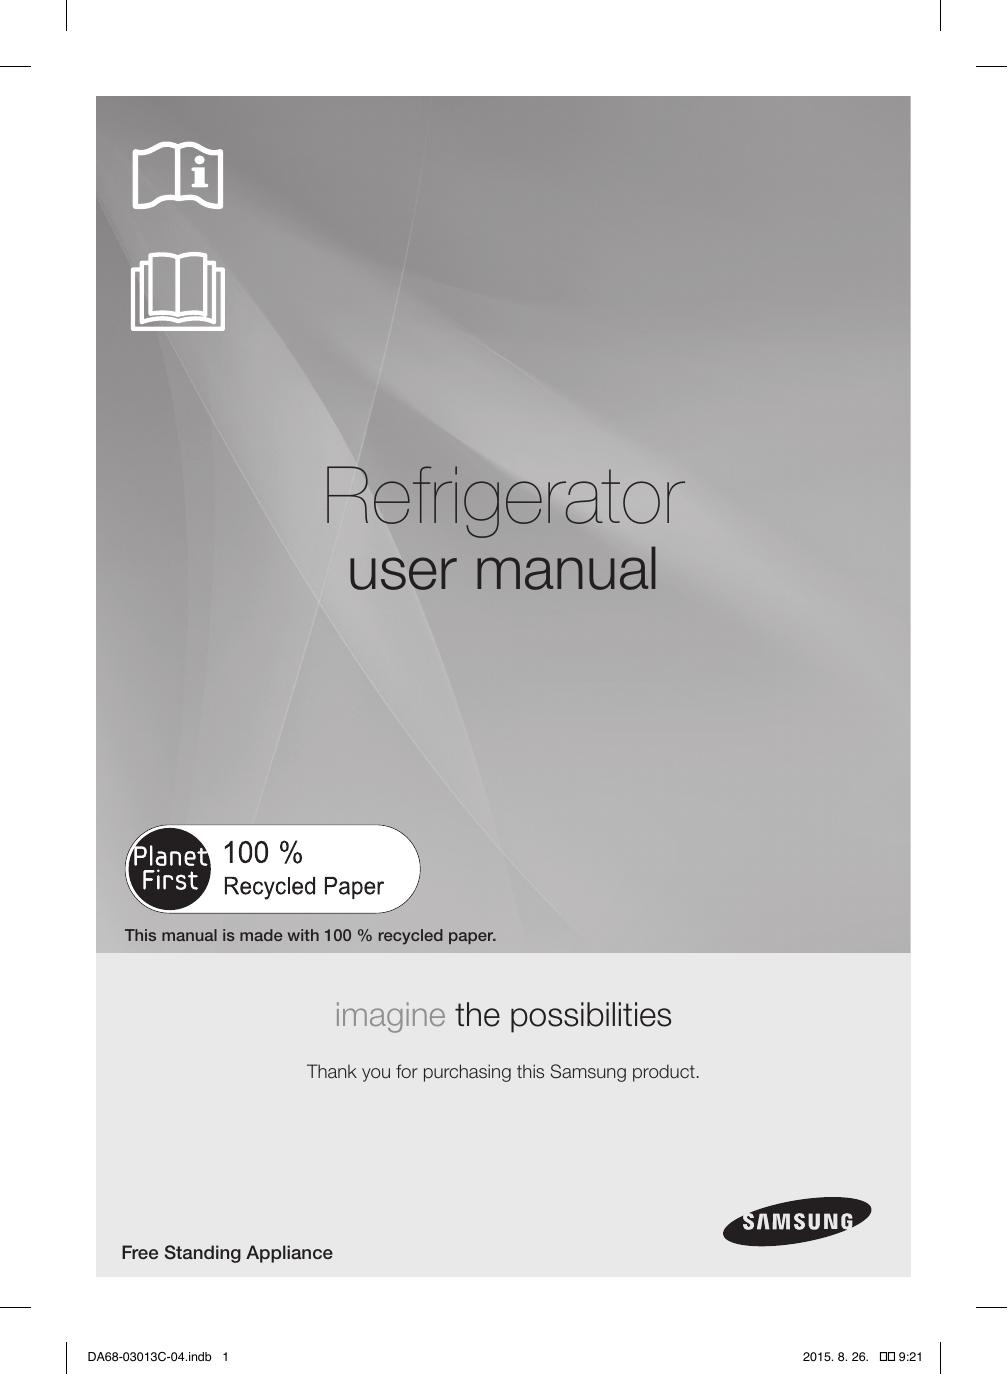 Samsung HERMES User Manual